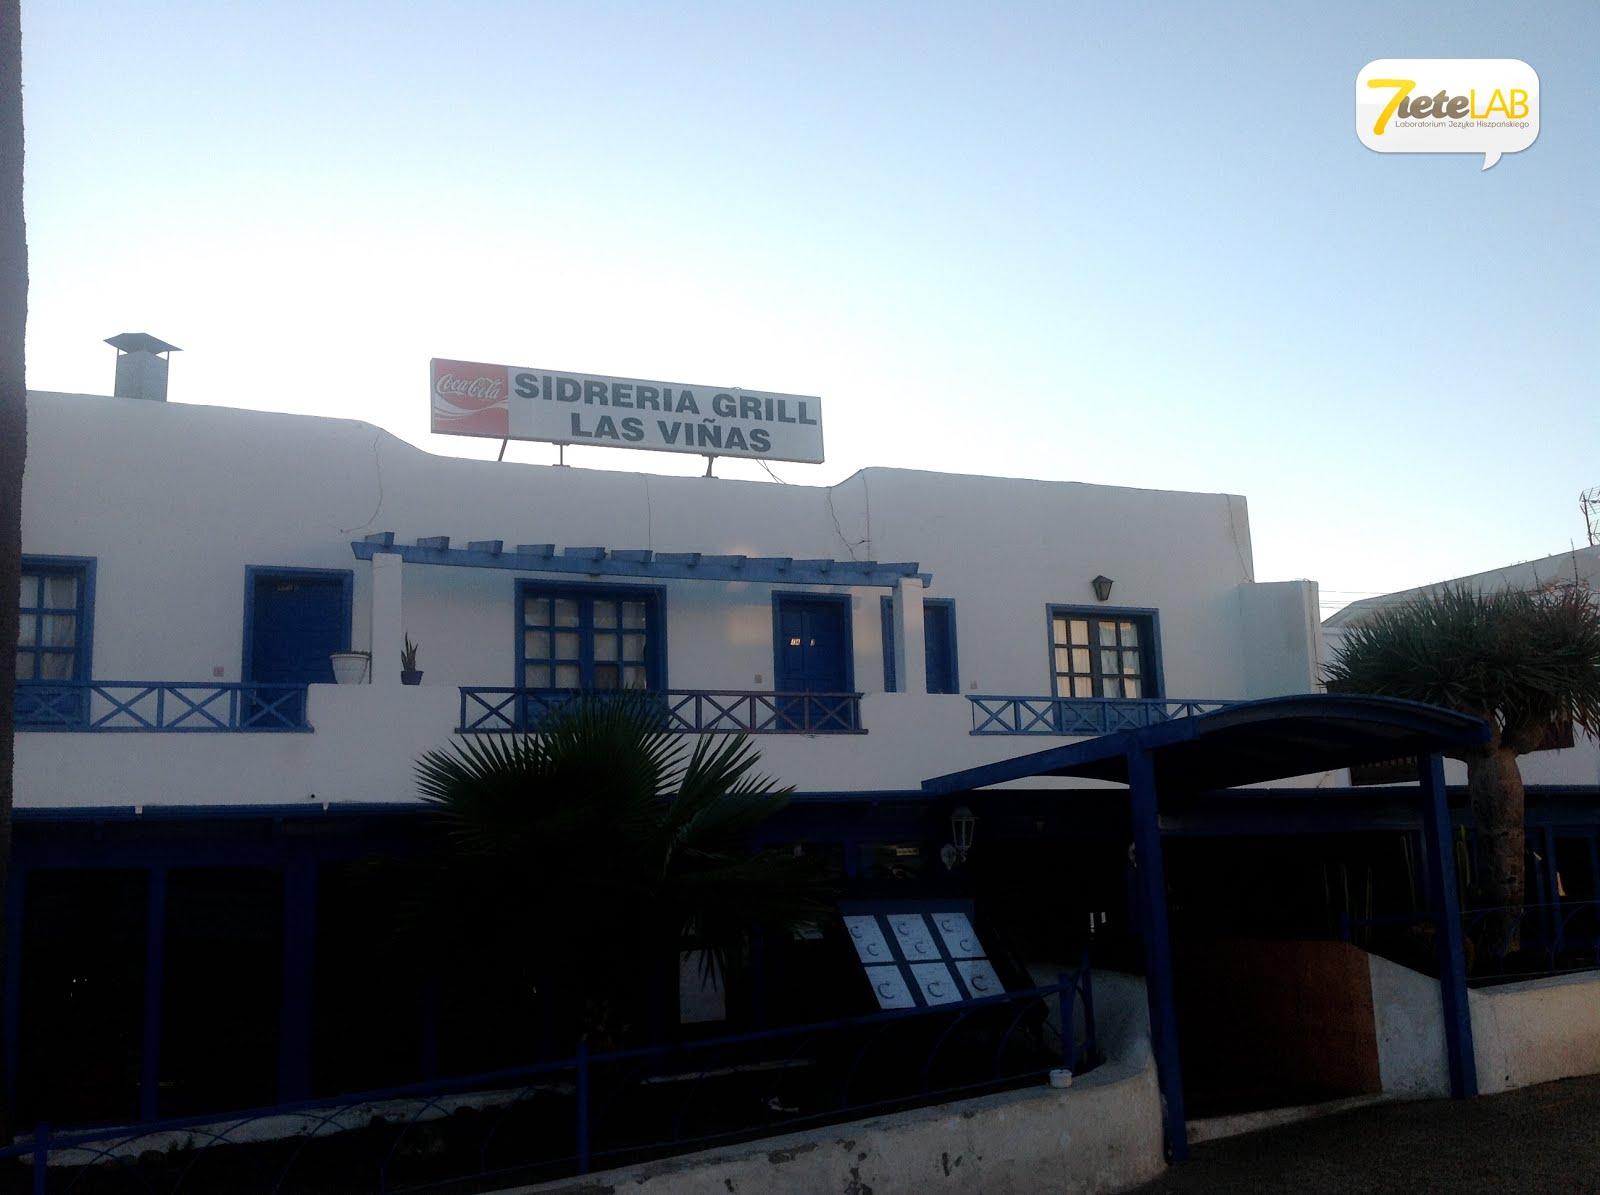 7ieteLAB español - Sidrería Grill Las Viñas en Playa Honda